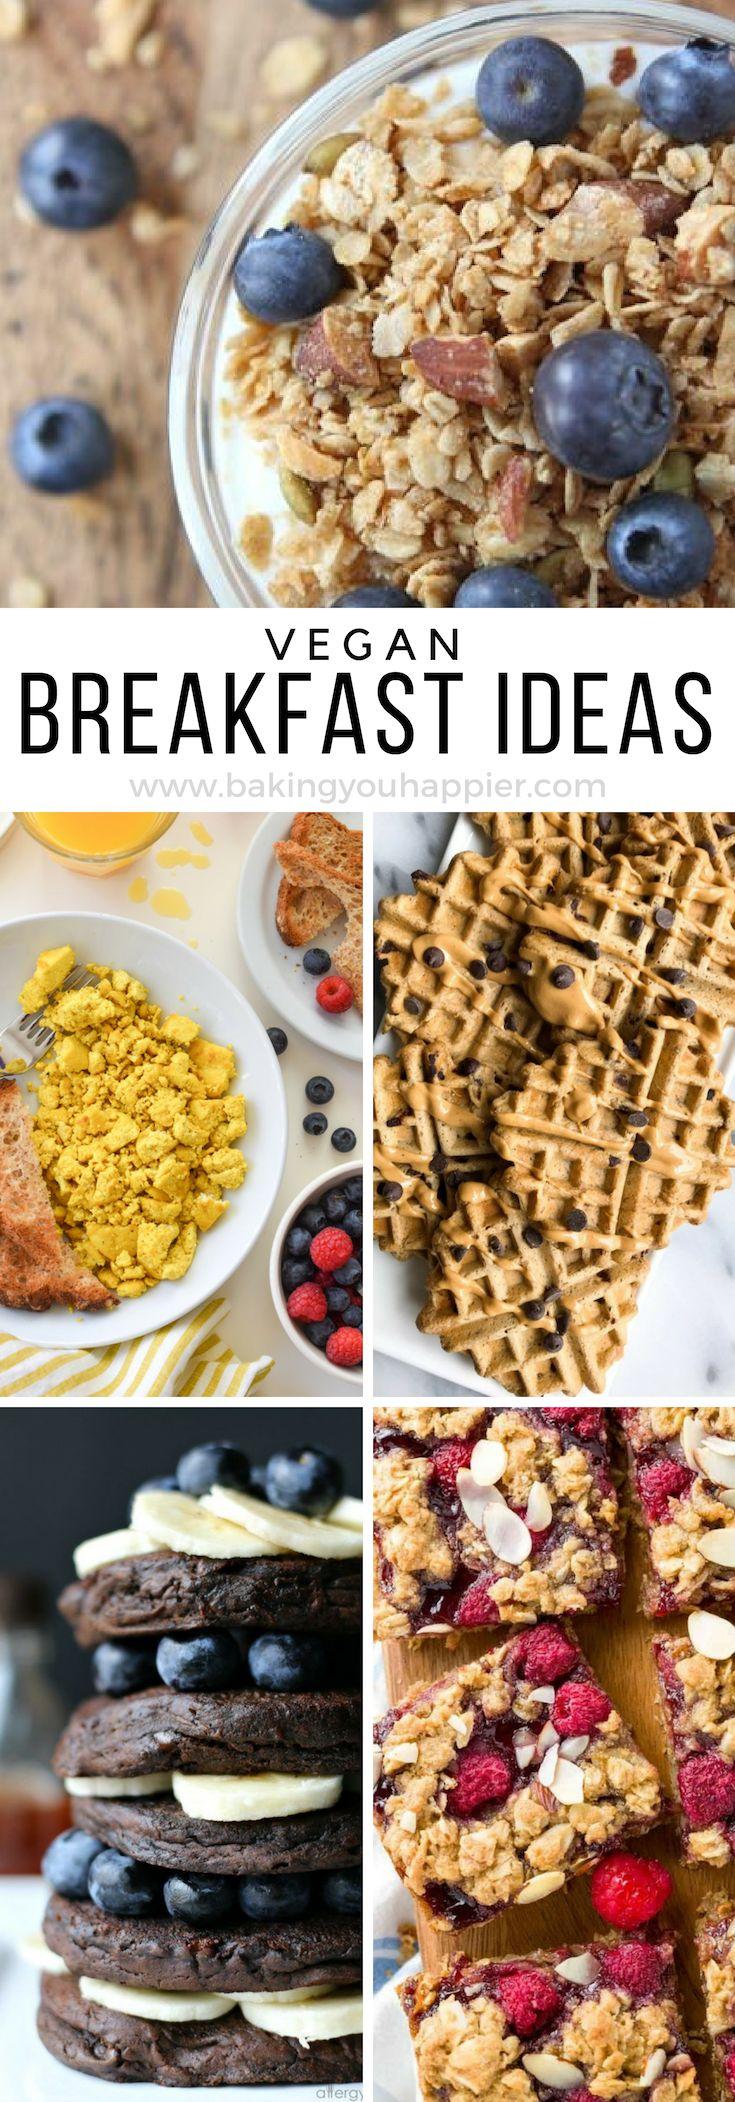 Quick and Easy Vegan Breakfast Ideas